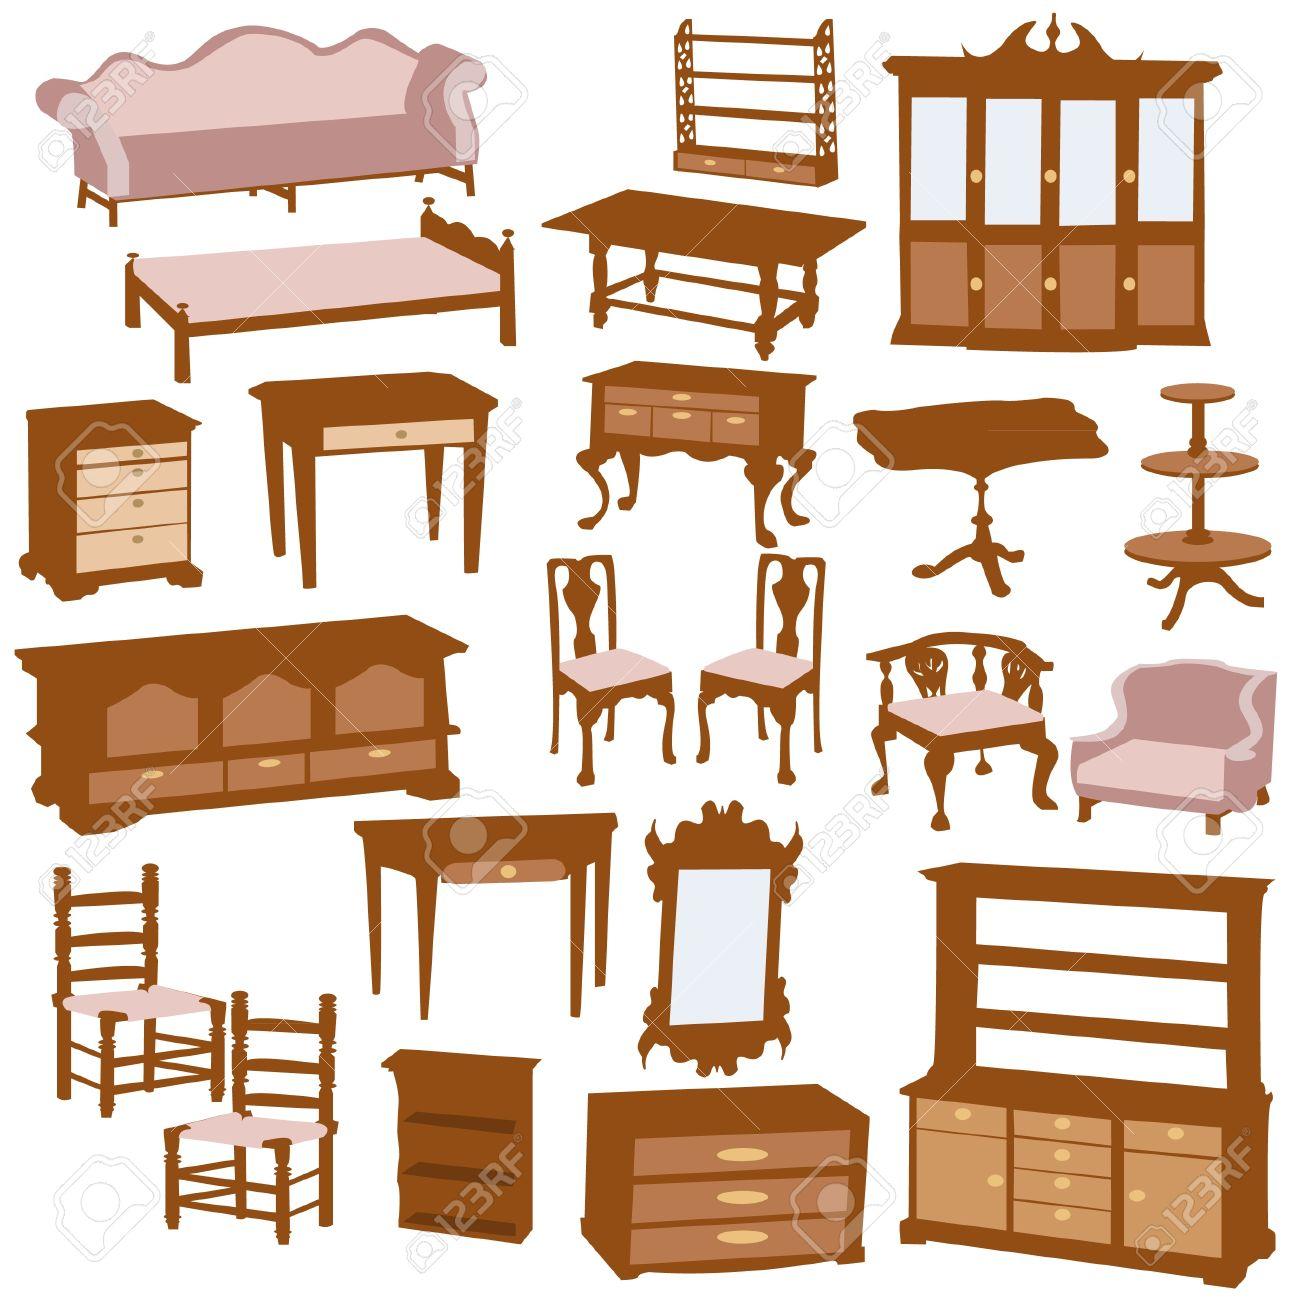 Furniture Clipart Wooden Illustration Stock Vector